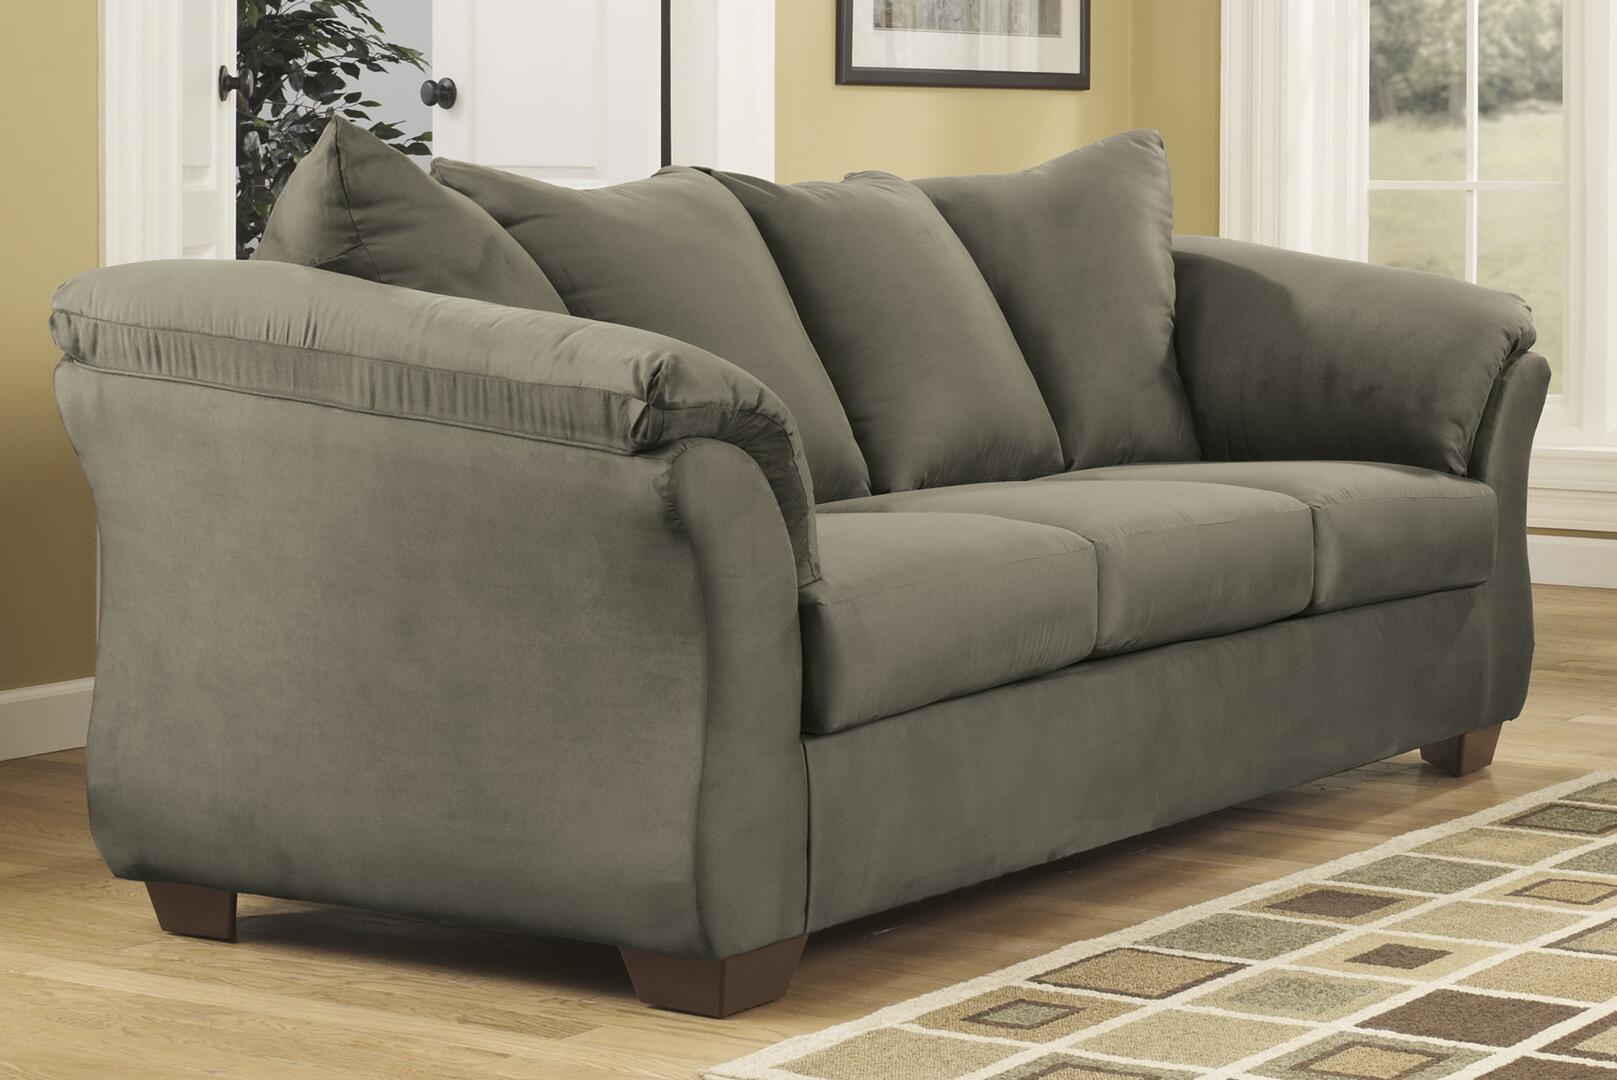 Ashley darcy sofa signature design by ashley darcy mocha for 750 sofa chaise